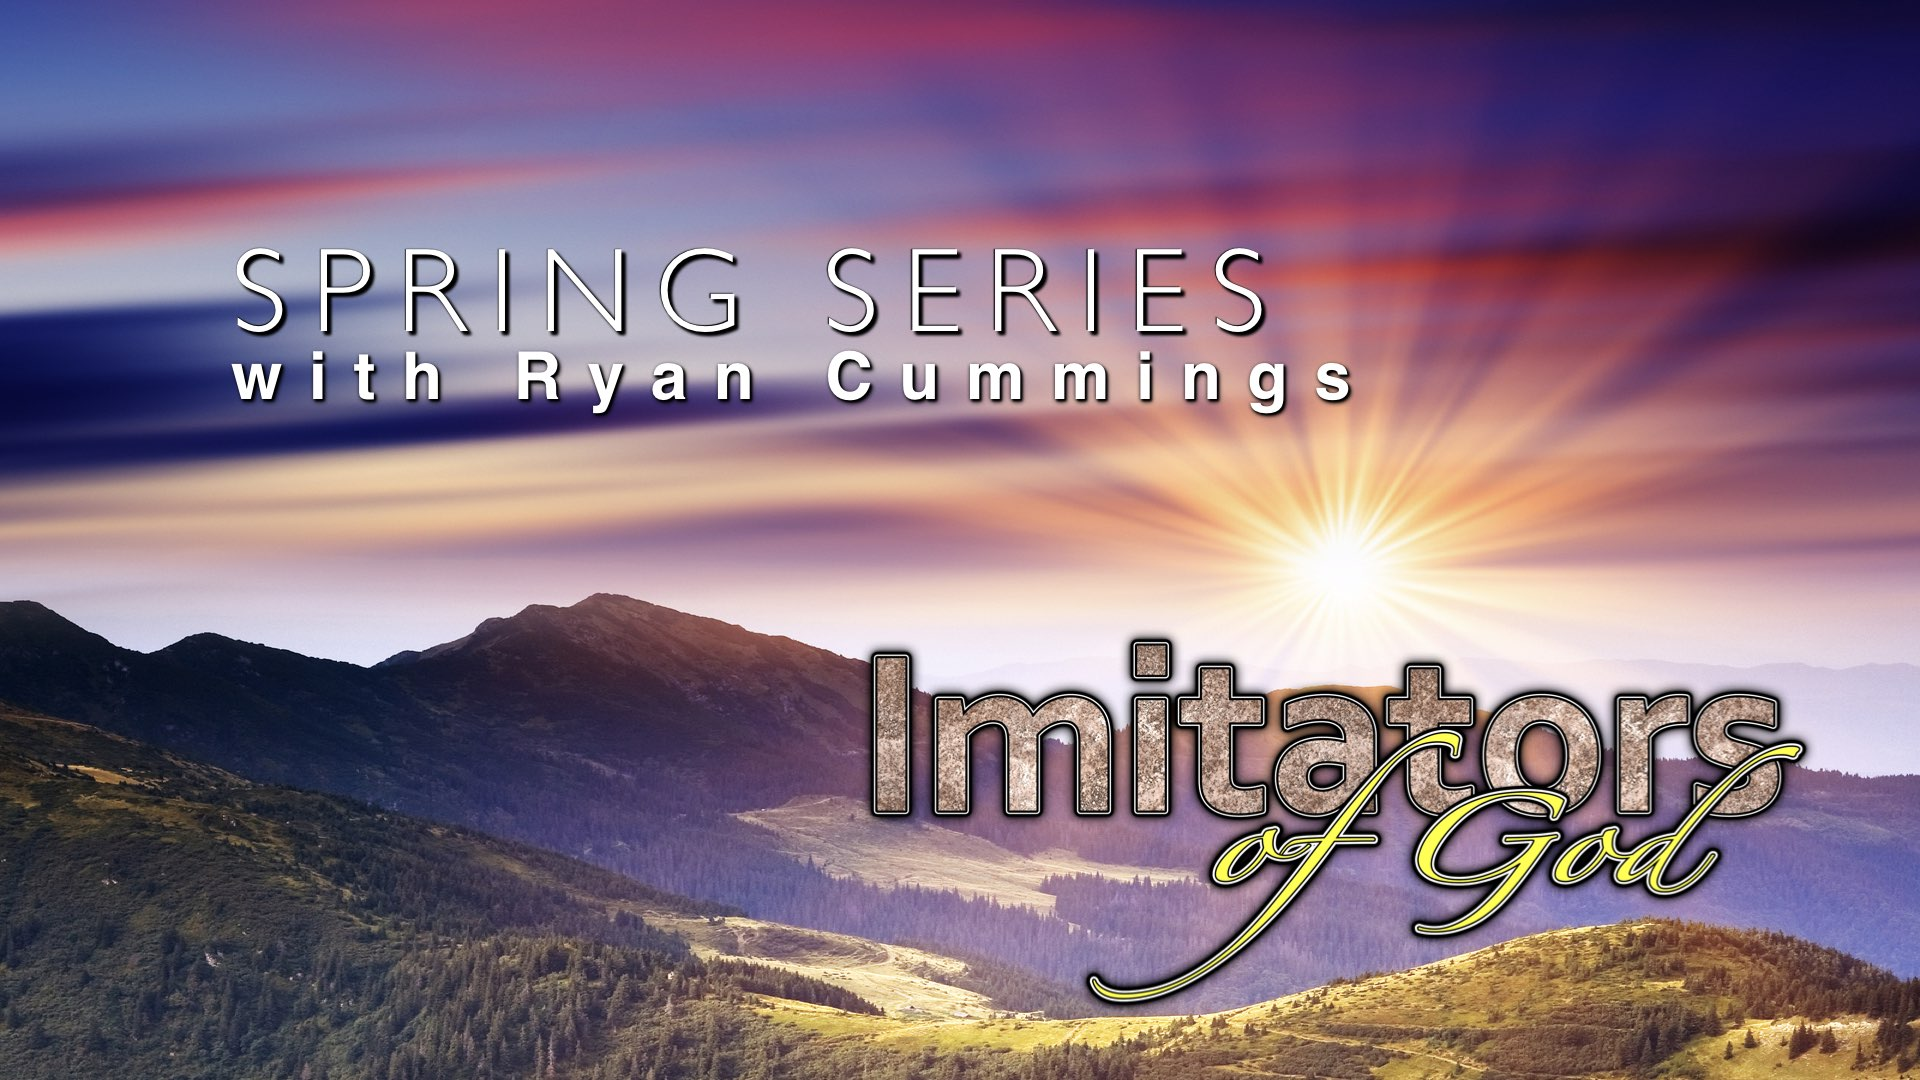 Spring Series with Ryan Cummings